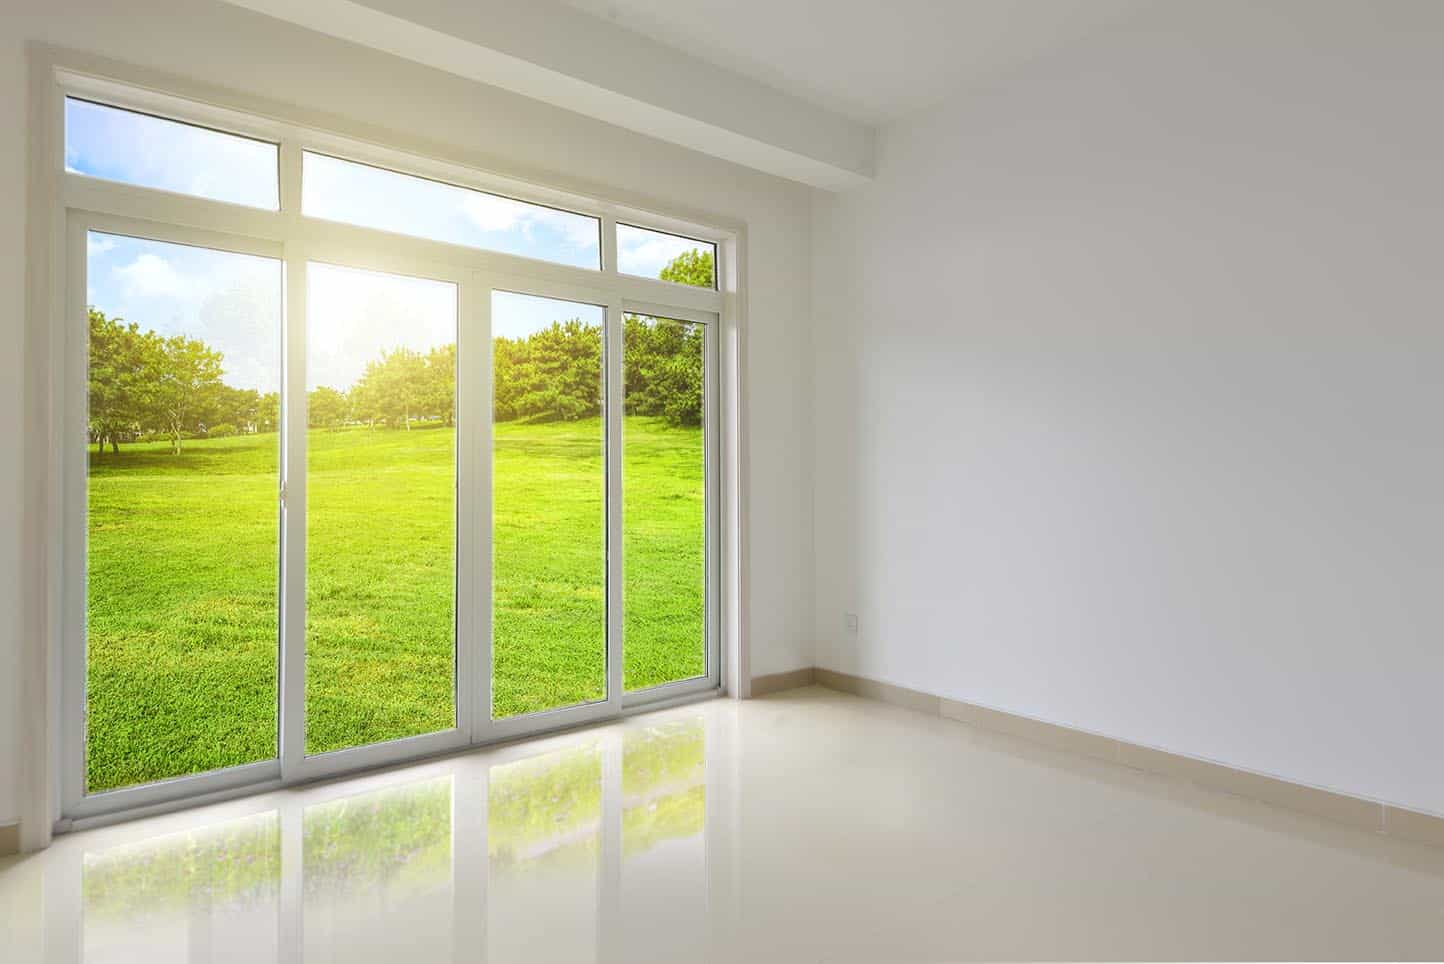 Transom windows growing above sliding doors